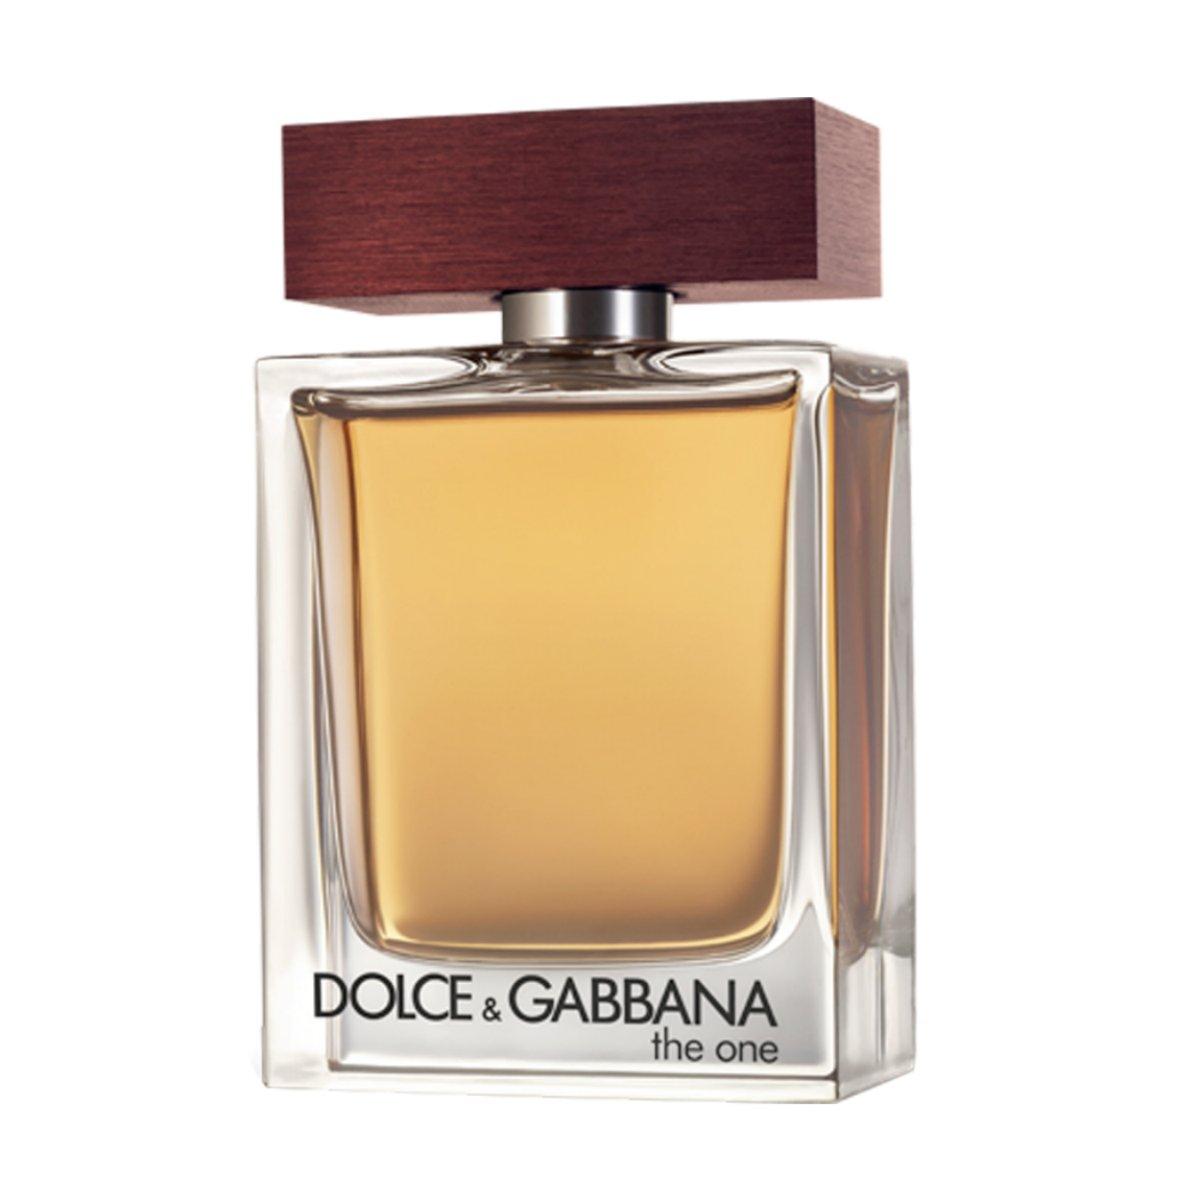 Dolce&Gabbana The One Men Eau De Parfum 100ml